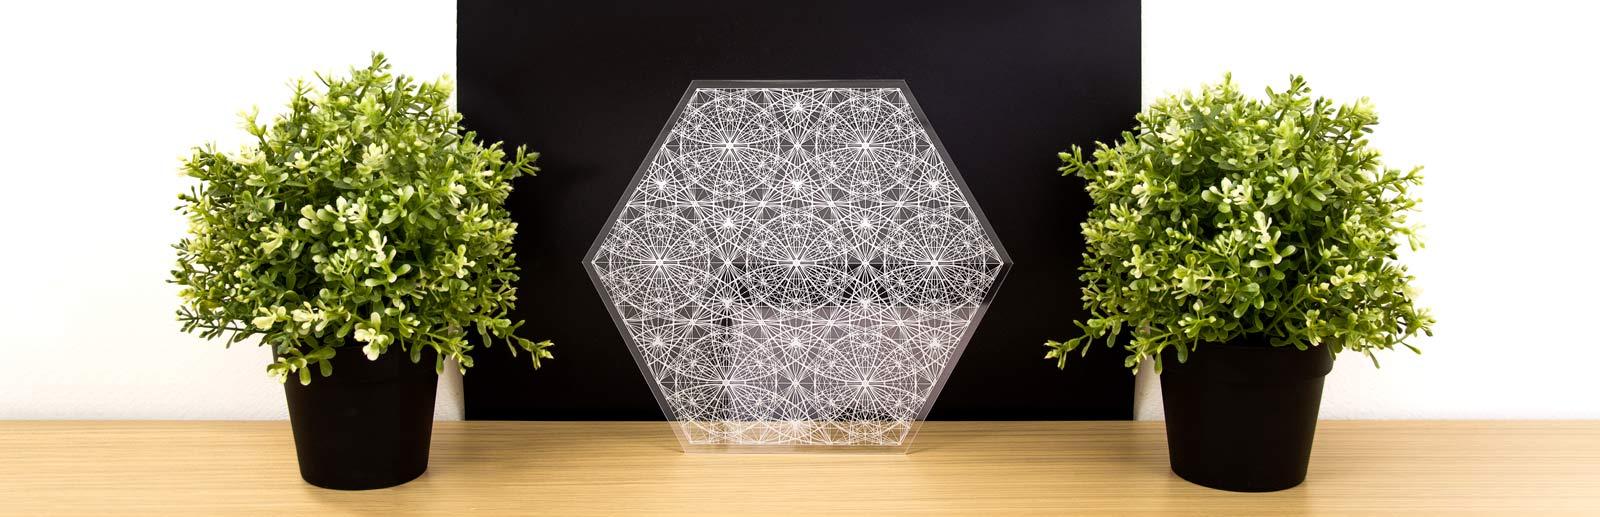 Heilige Geometrie Woondecoratie